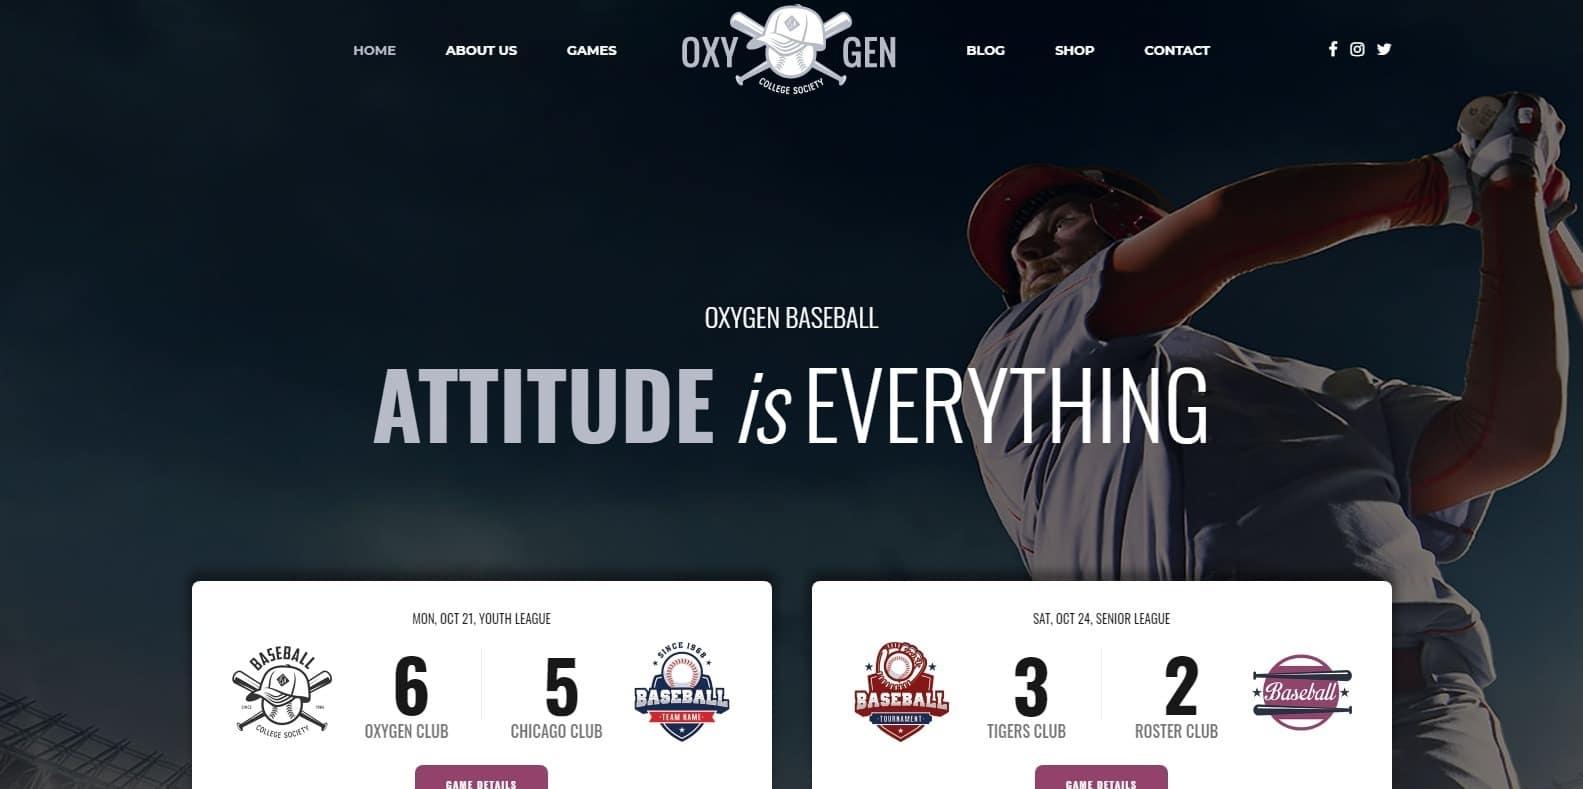 oxigeno-softball-website-template-wordpress